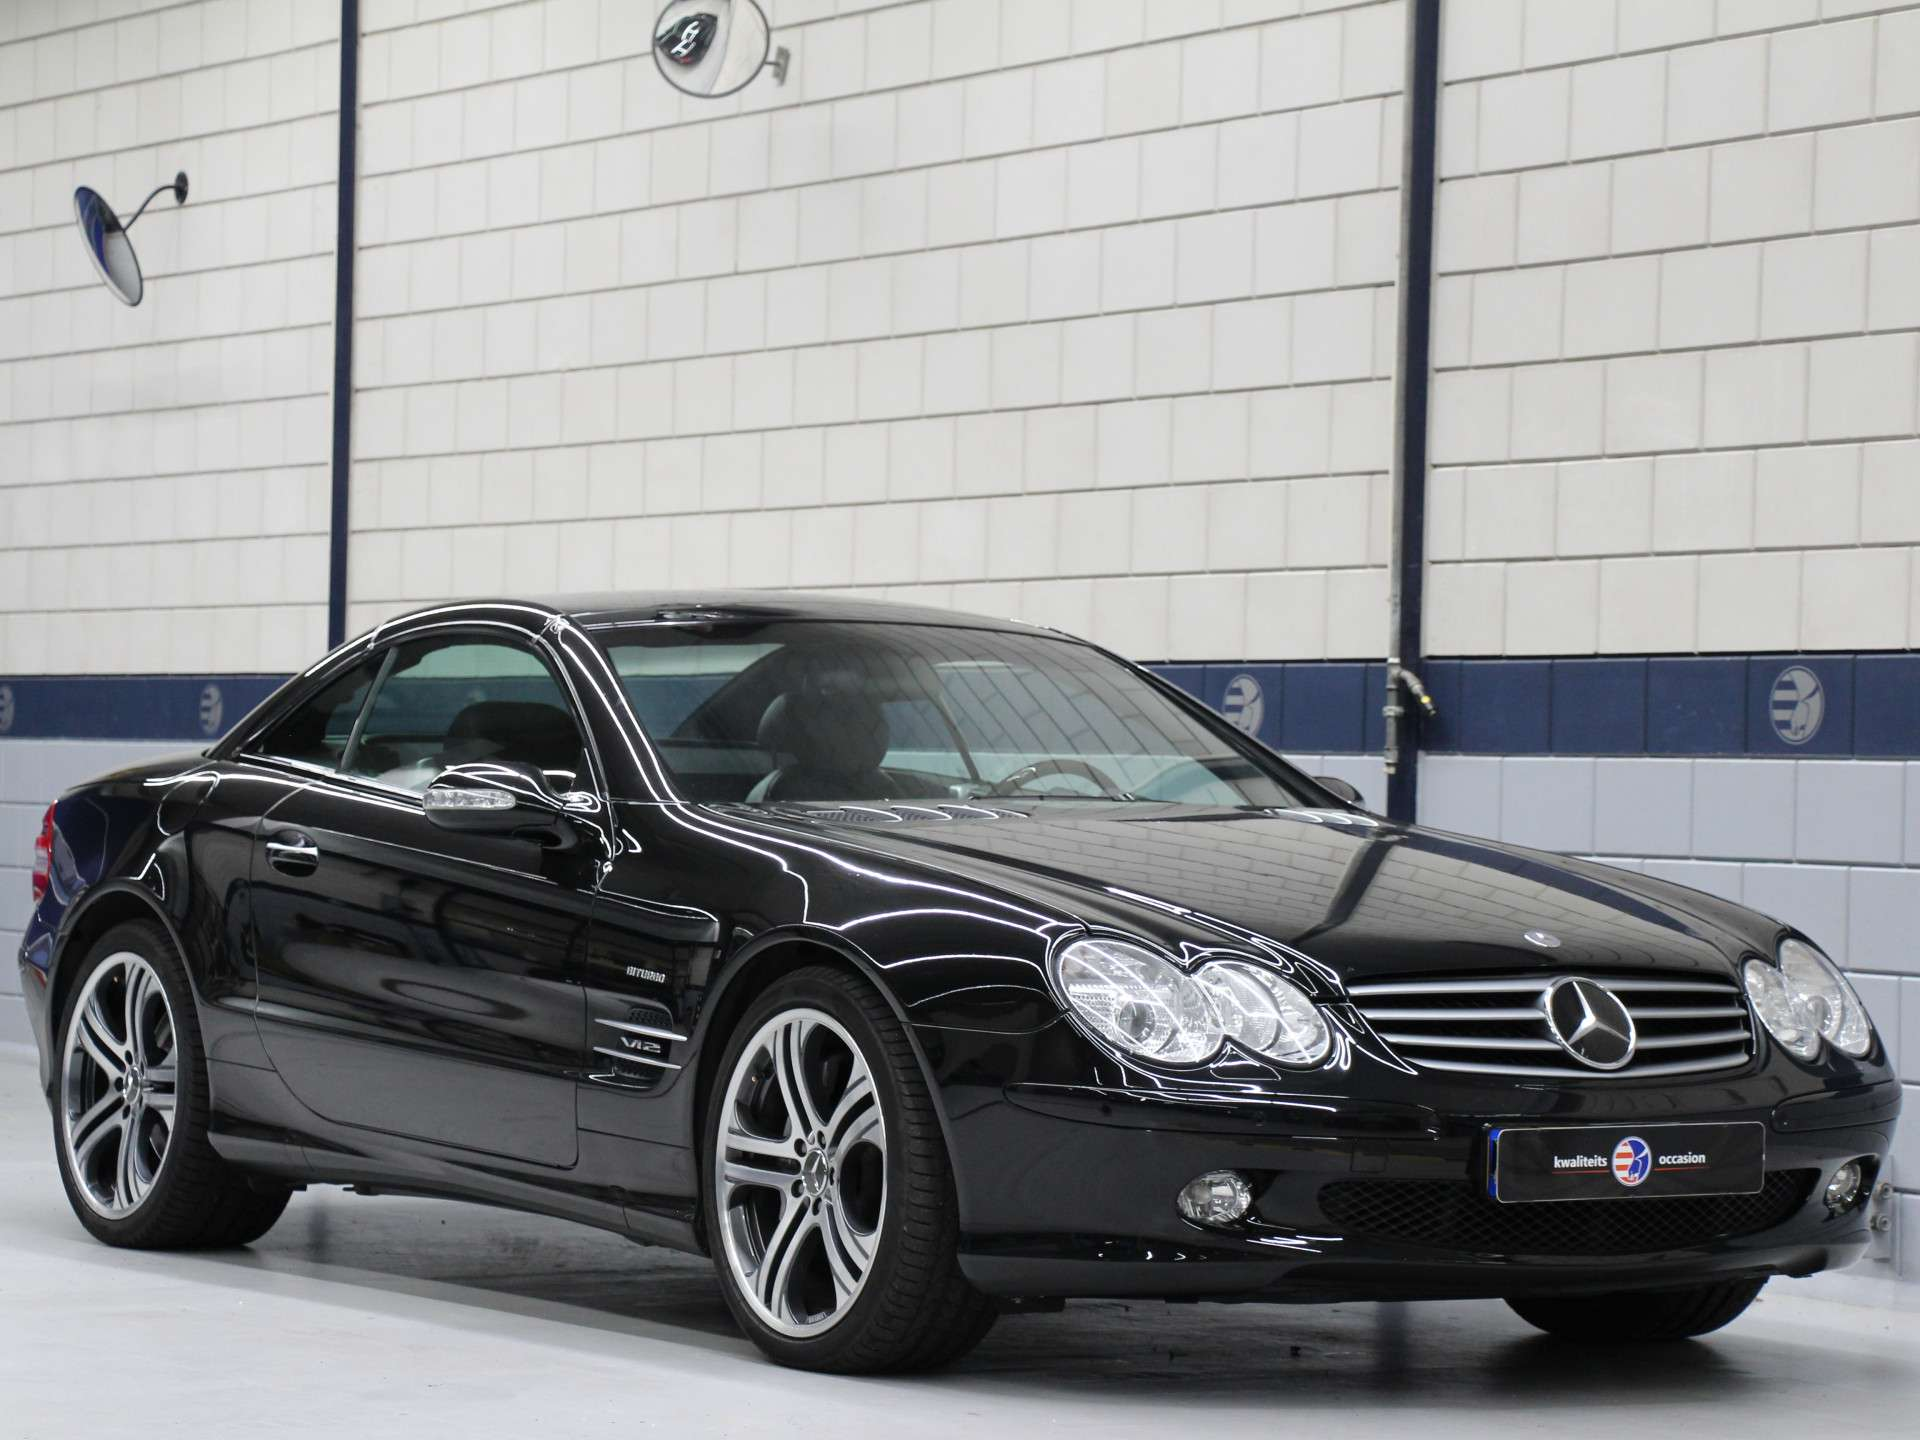 Tweedehands Mercedes-Benz SL600 V12 occasion